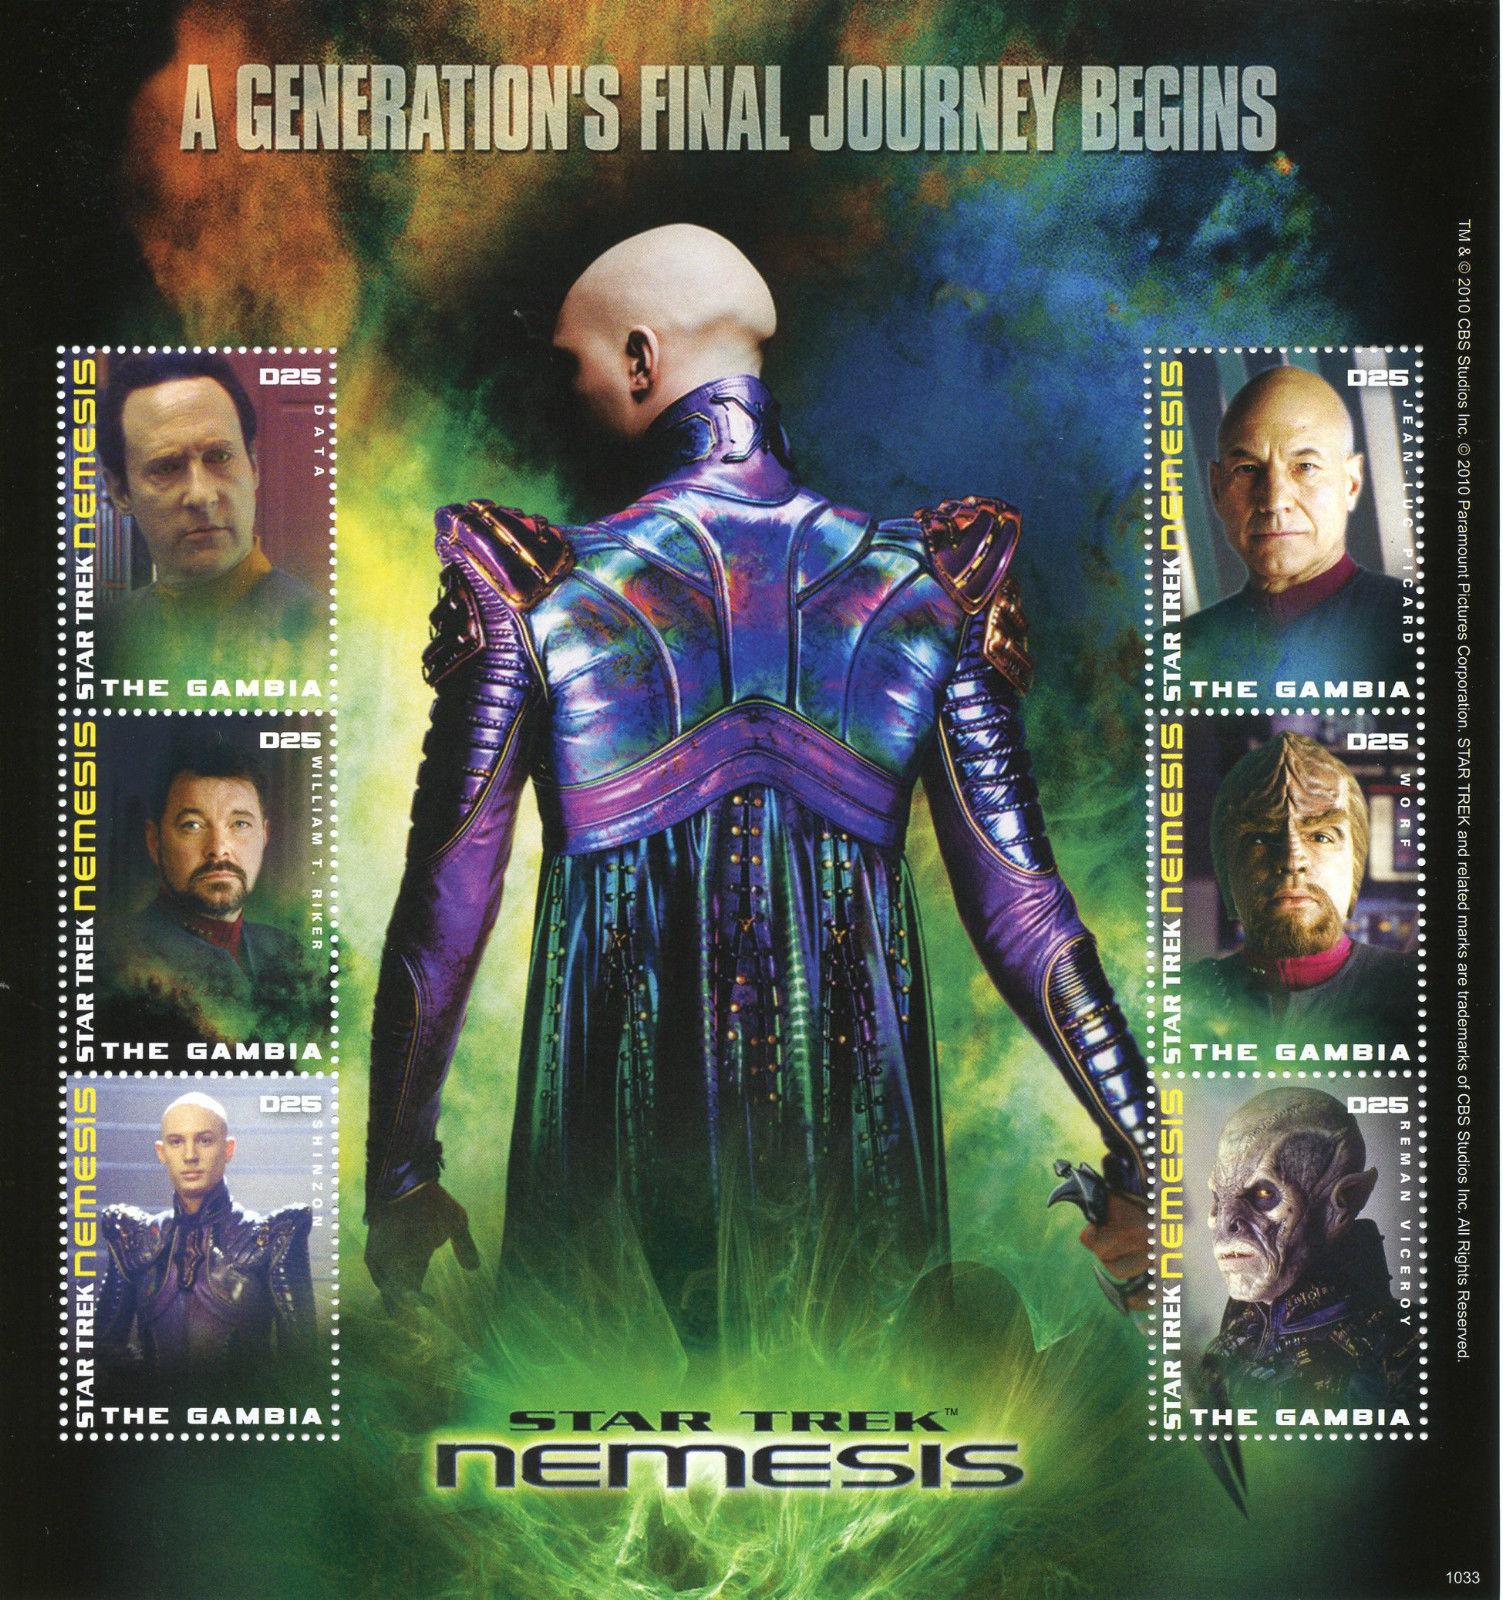 Antigua MNH 2008 Star Trek Sheet of 6 stamps